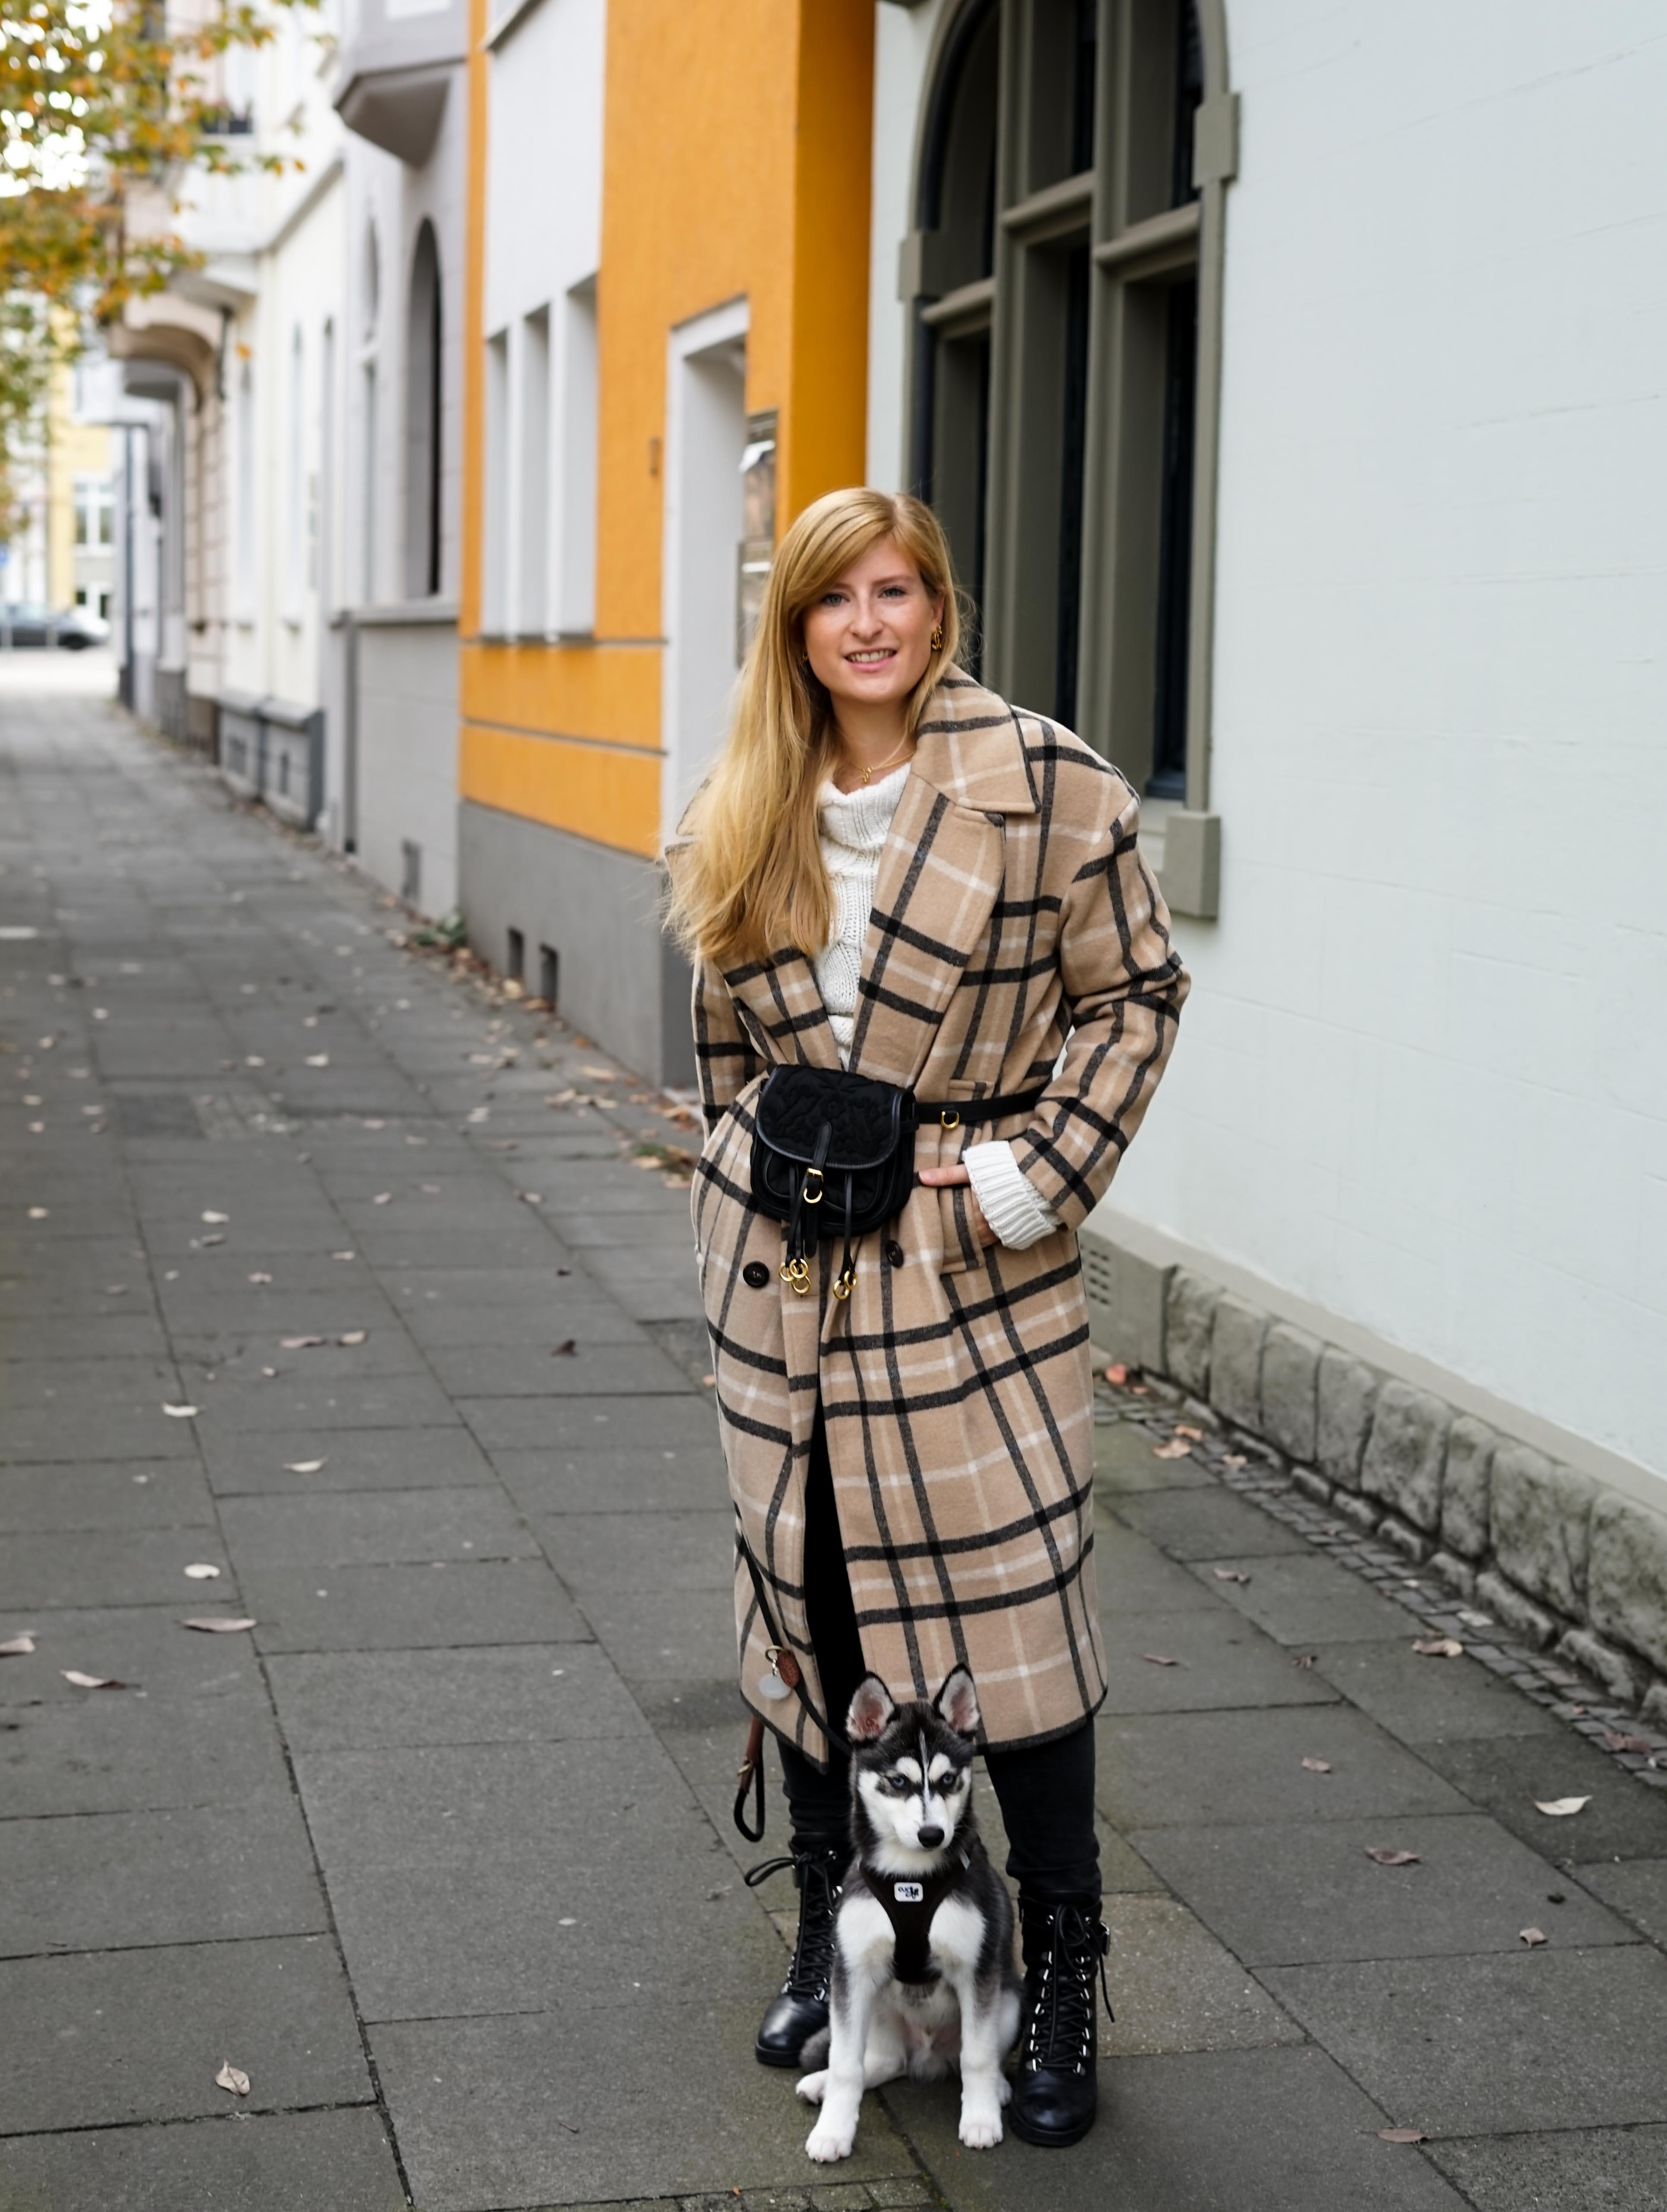 Oversized Wollmantel karriert Gürteltasche Prada Herbstoutfit Herbstlook Pomsky Streetstyle Bonn 3